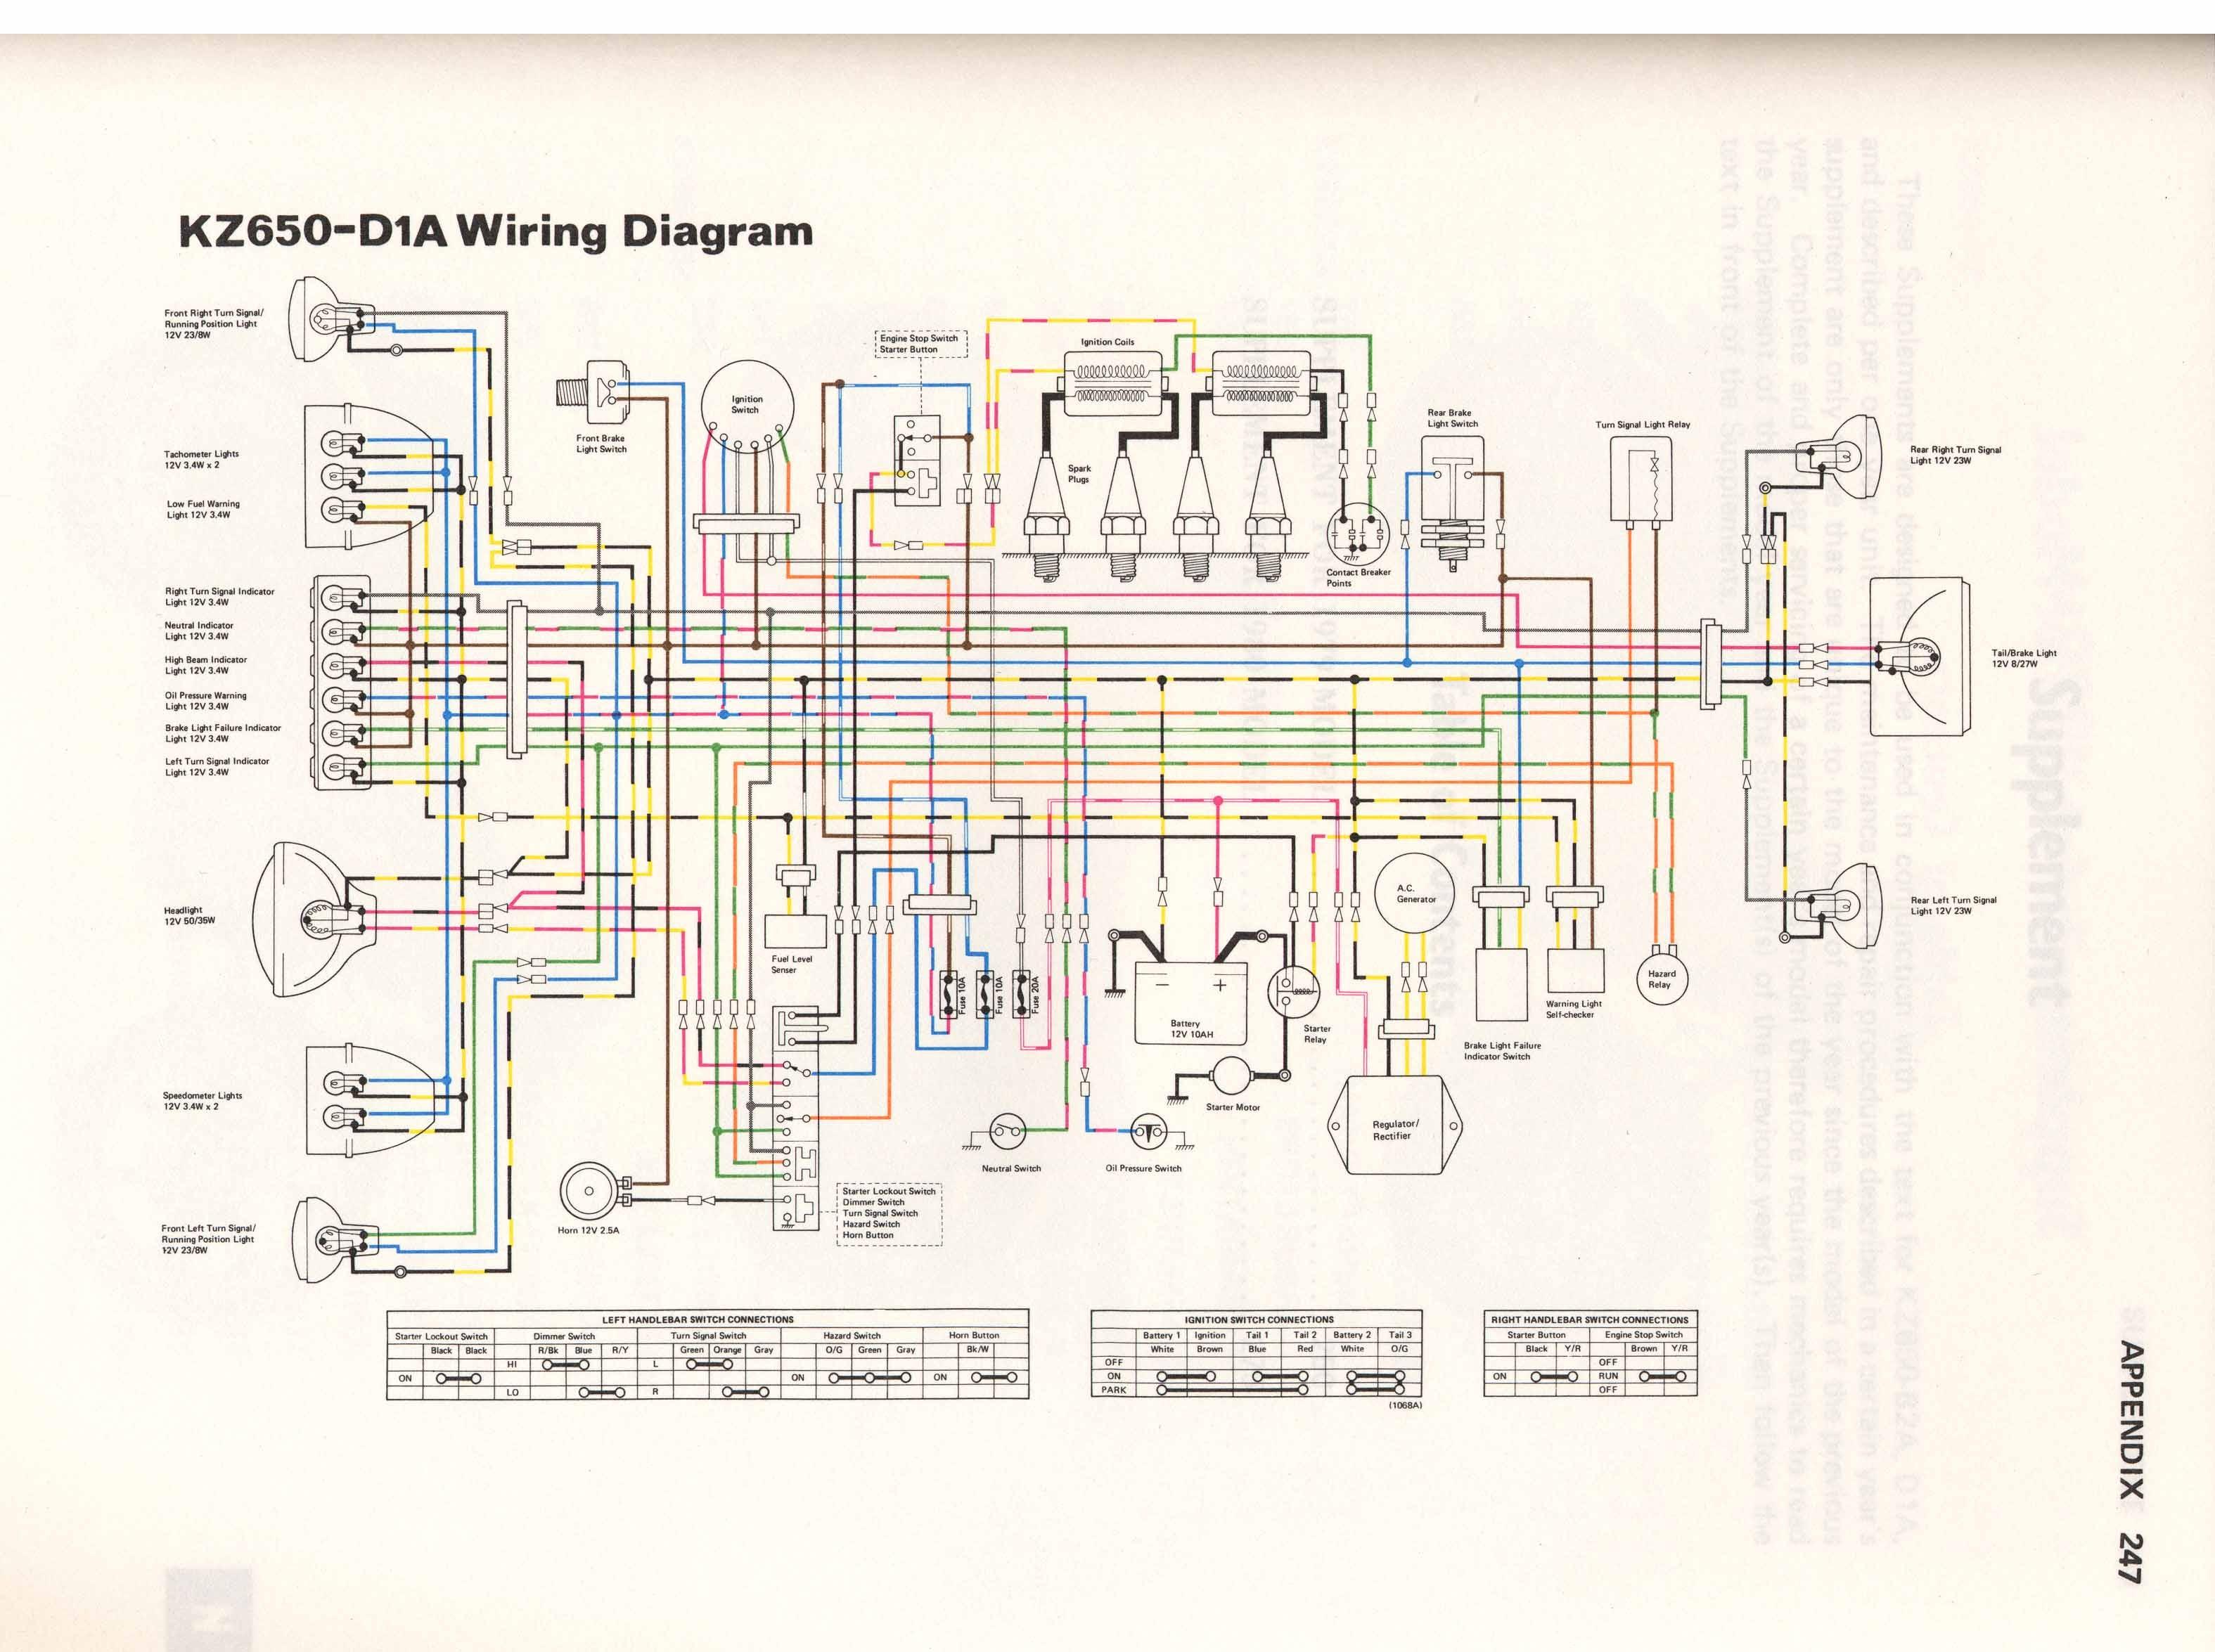 Kawasaki Kz650 Wiring Diagram - Wiring Diagram Review on